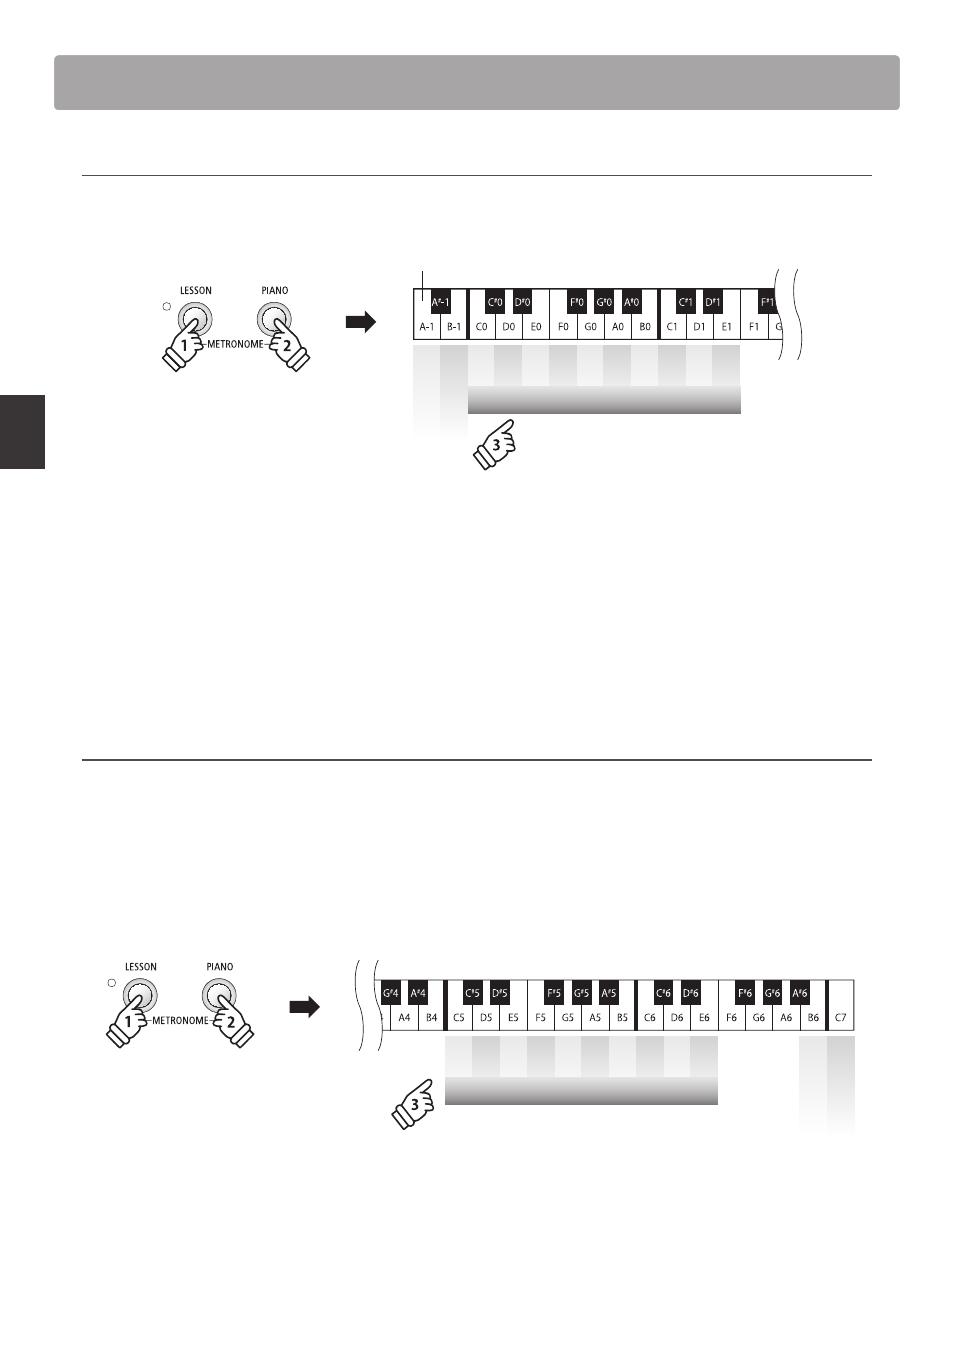 bc148c5d2a5 Metronome / drum rhythms, Adjusting the metronome tempo, Drum ...